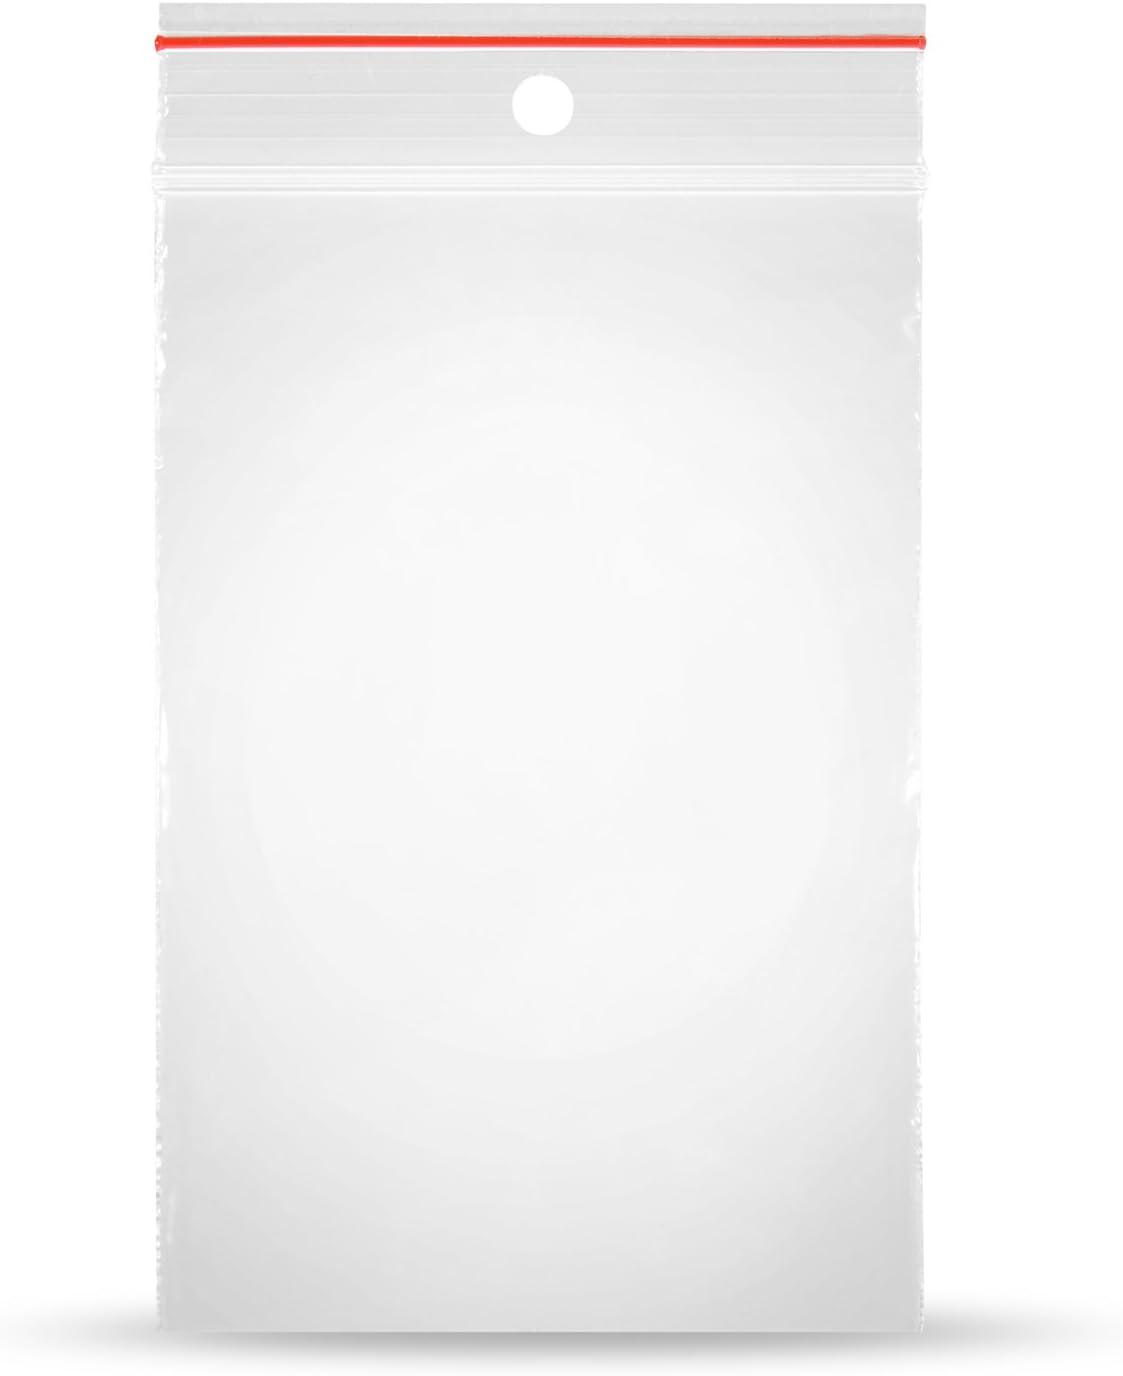 100 Druckverschlussbeutel Tüten Tütchen transparent Zipper Beutel 100x180mm